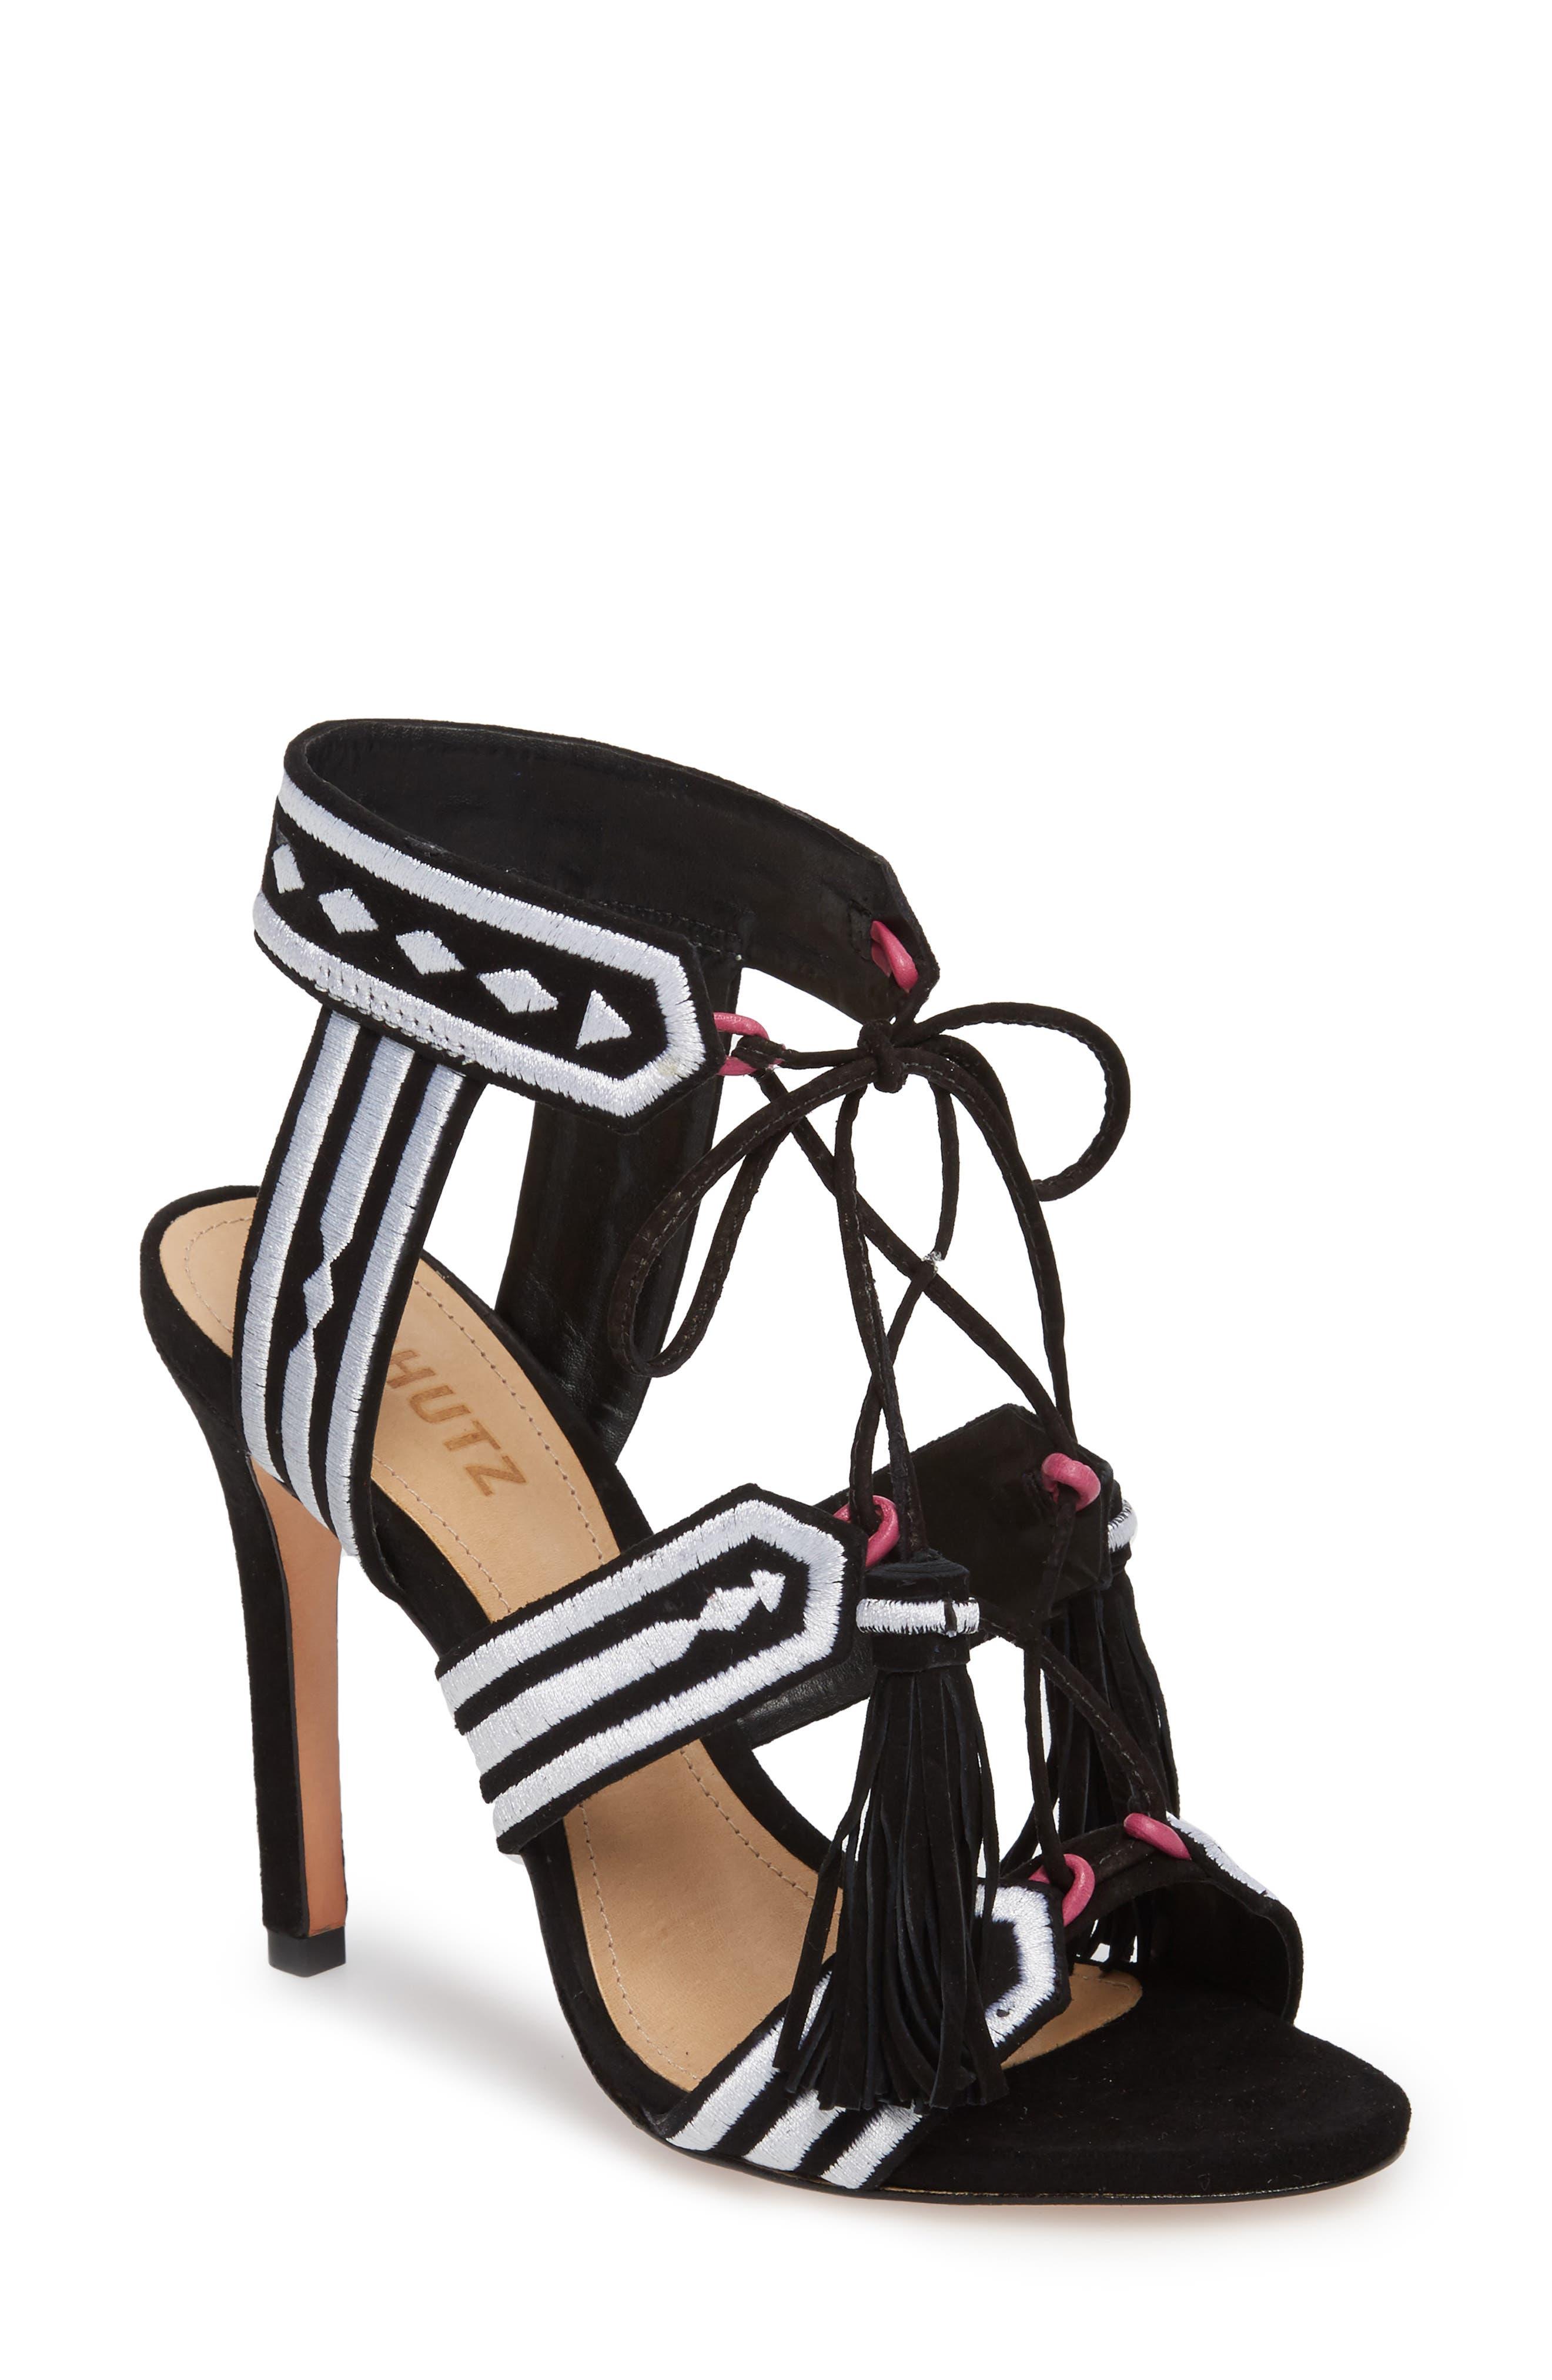 Eurica Embroidered Tassel Sandal,                         Main,                         color, 001